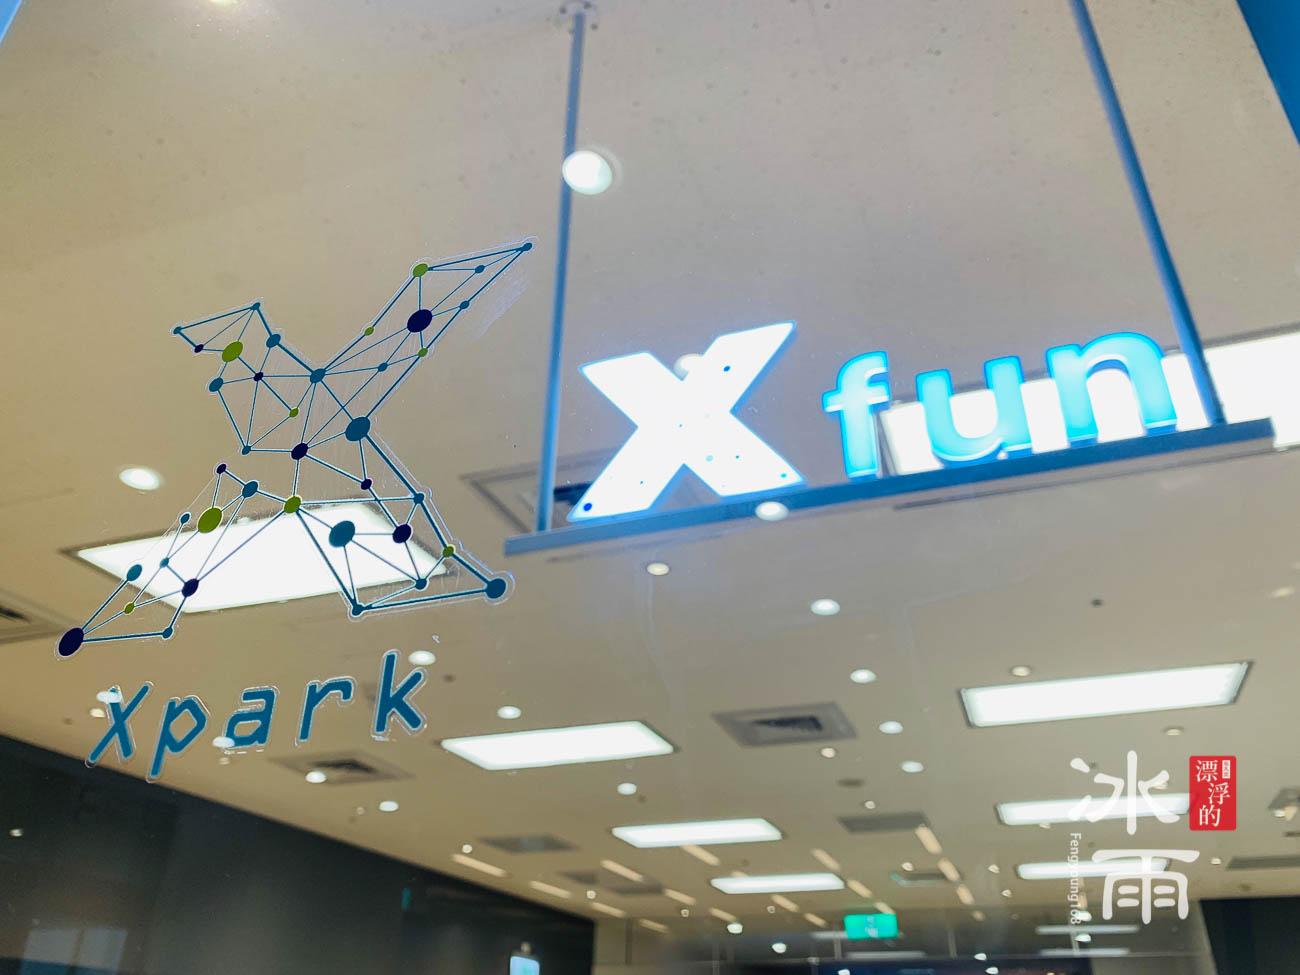 X fun Xpark水族館禮品專賣店 漂亮招牌